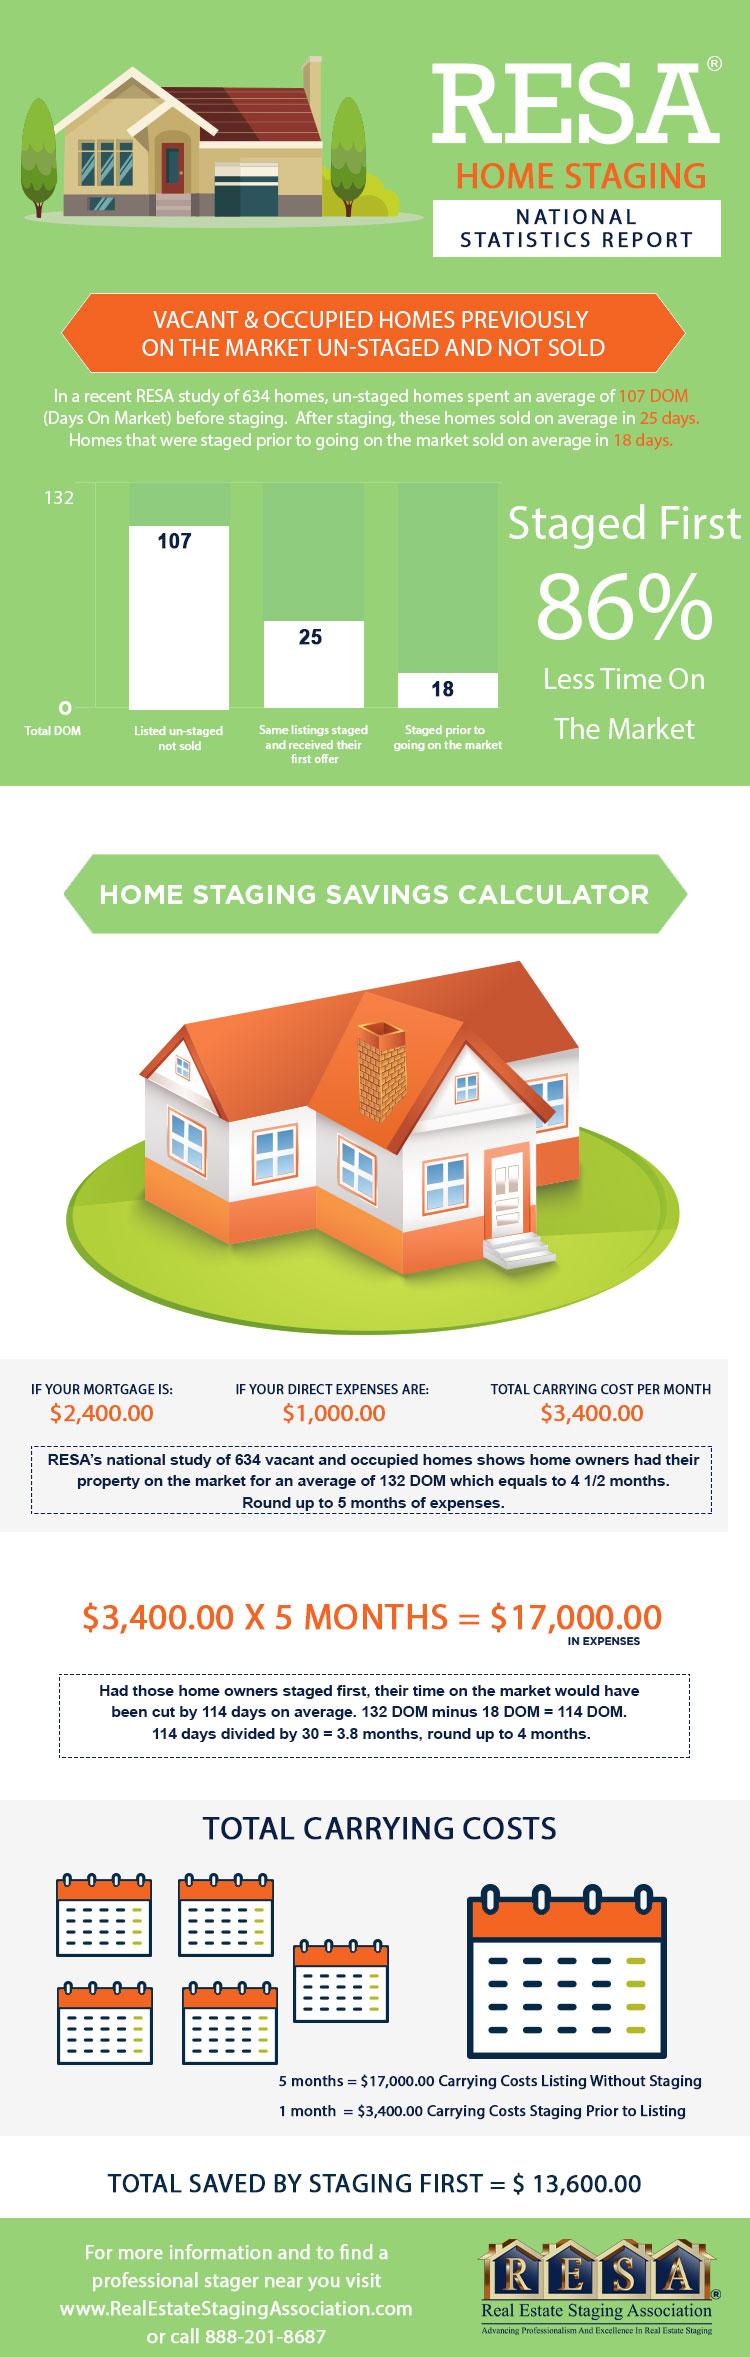 Source: 2018 RESA Home Staging-Statistics